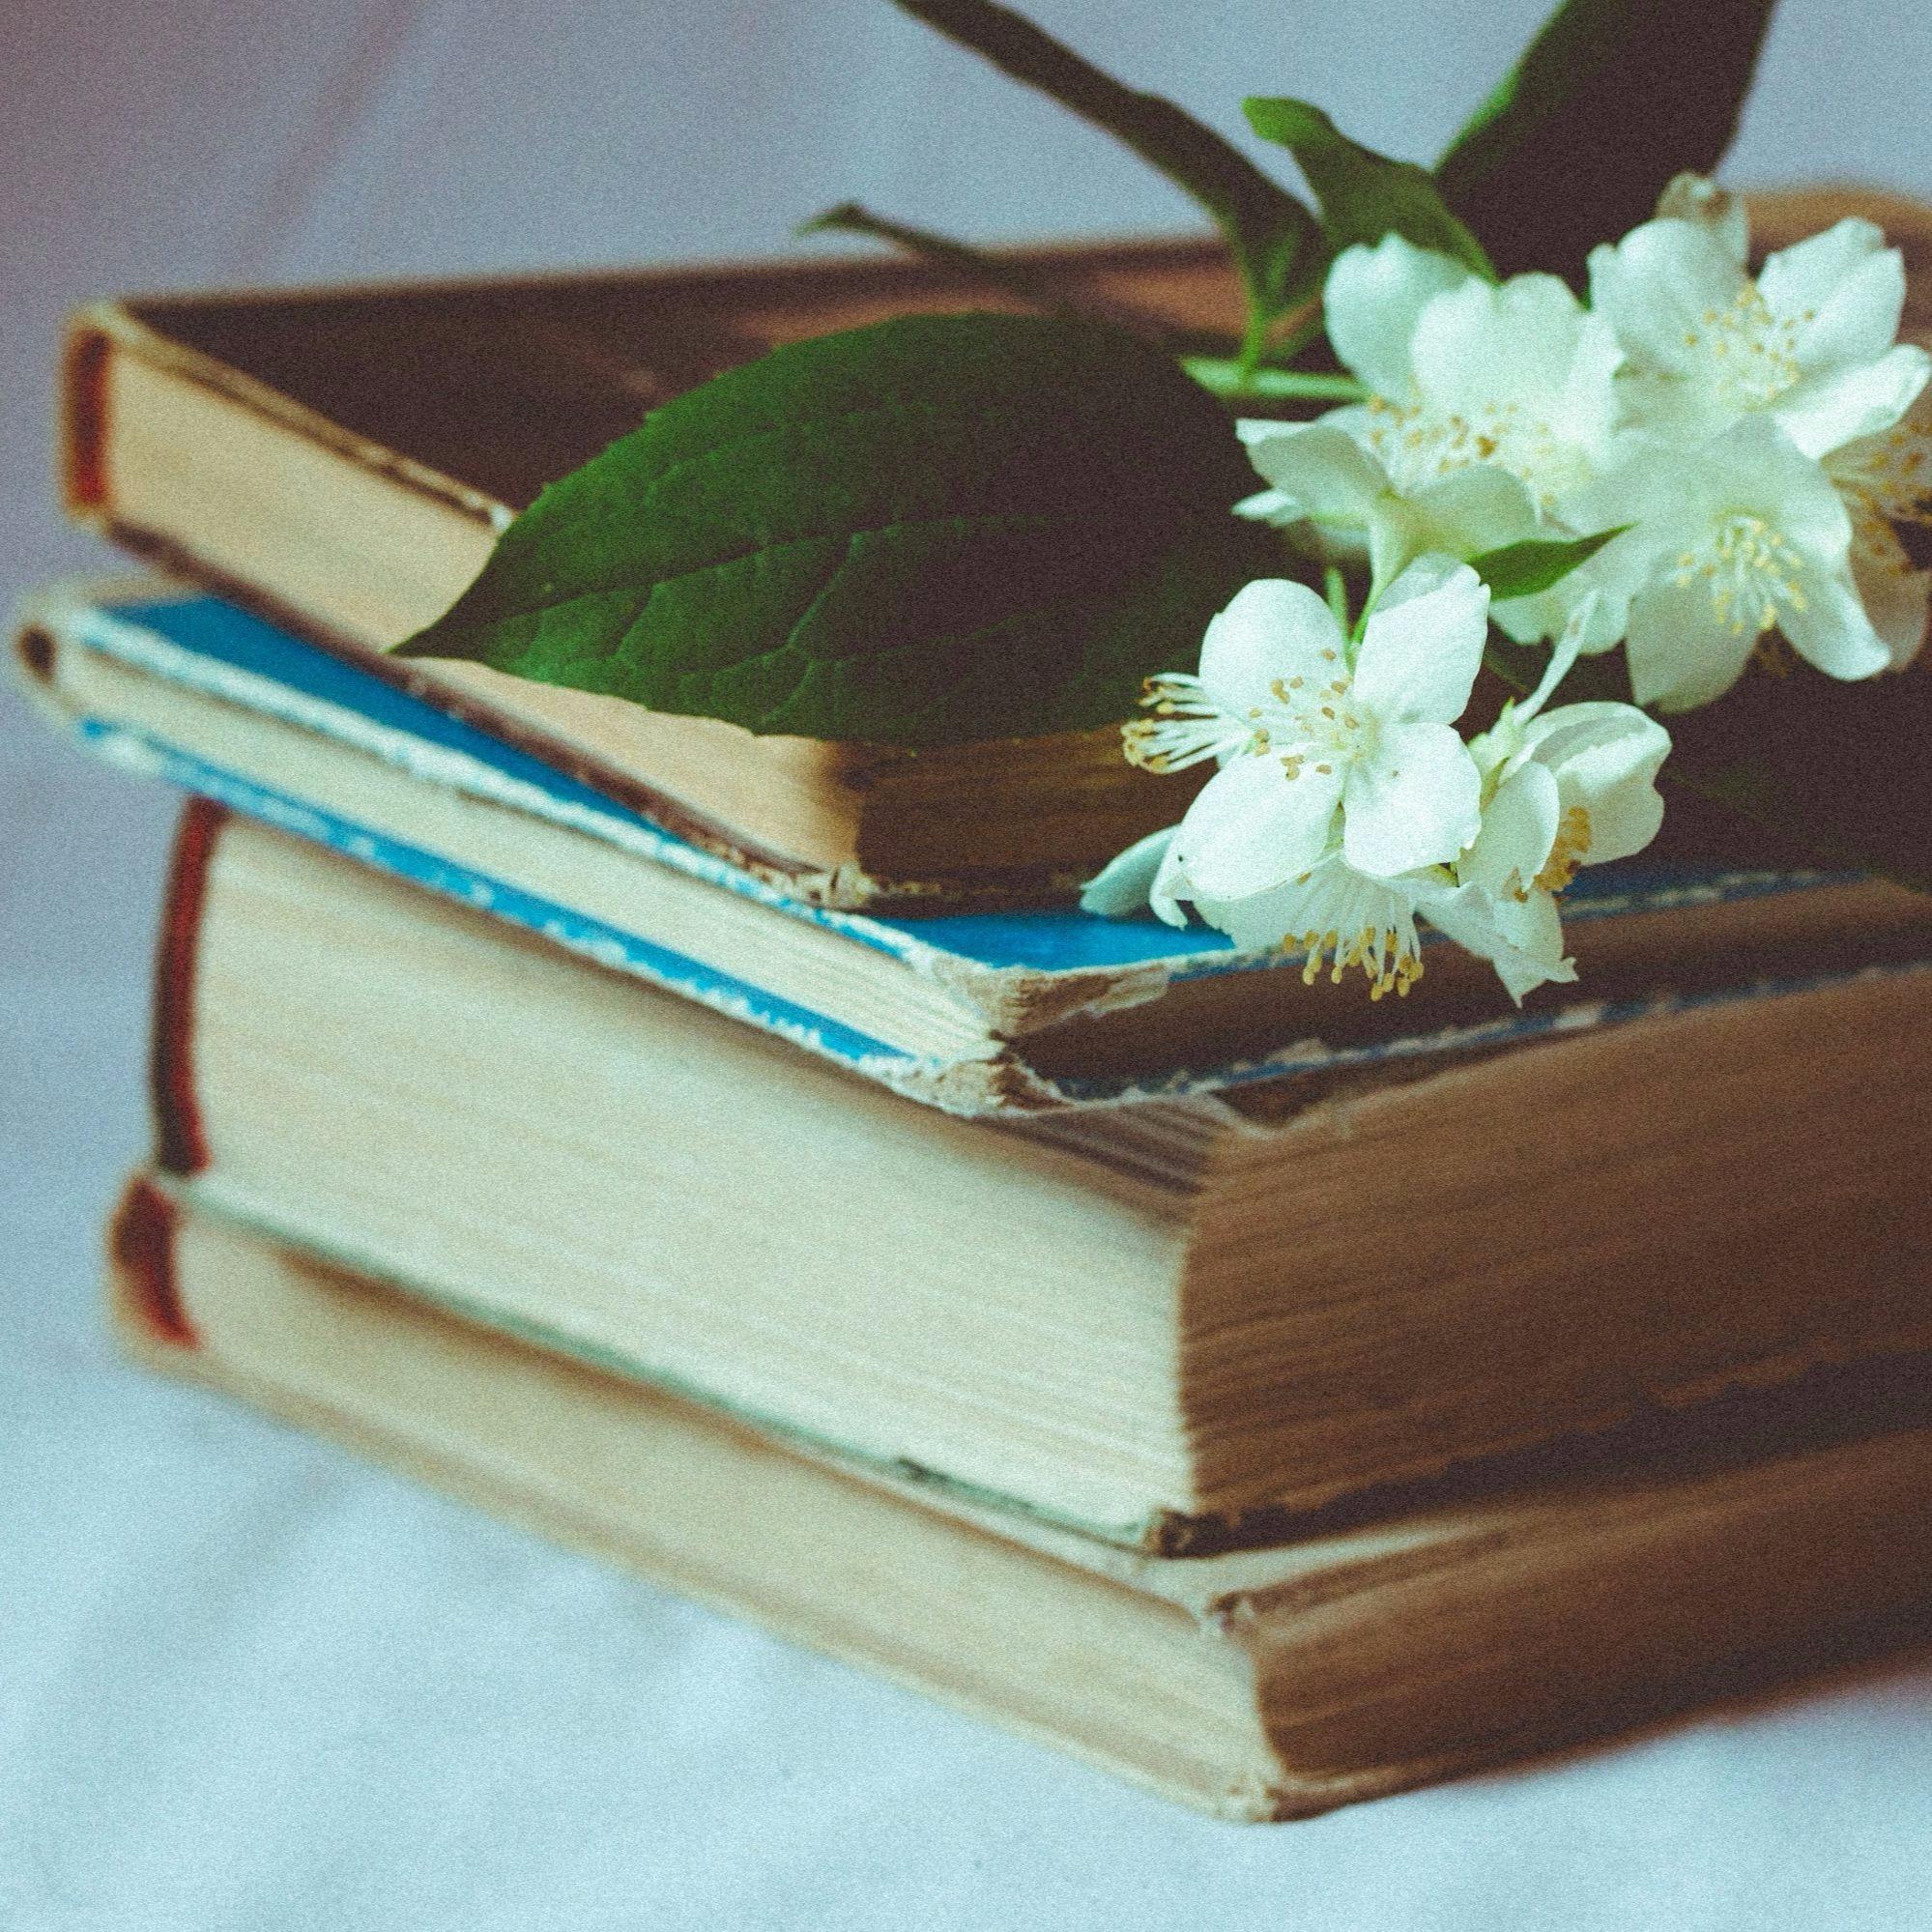 La importancia de leer para ser un buen copywriter profesional